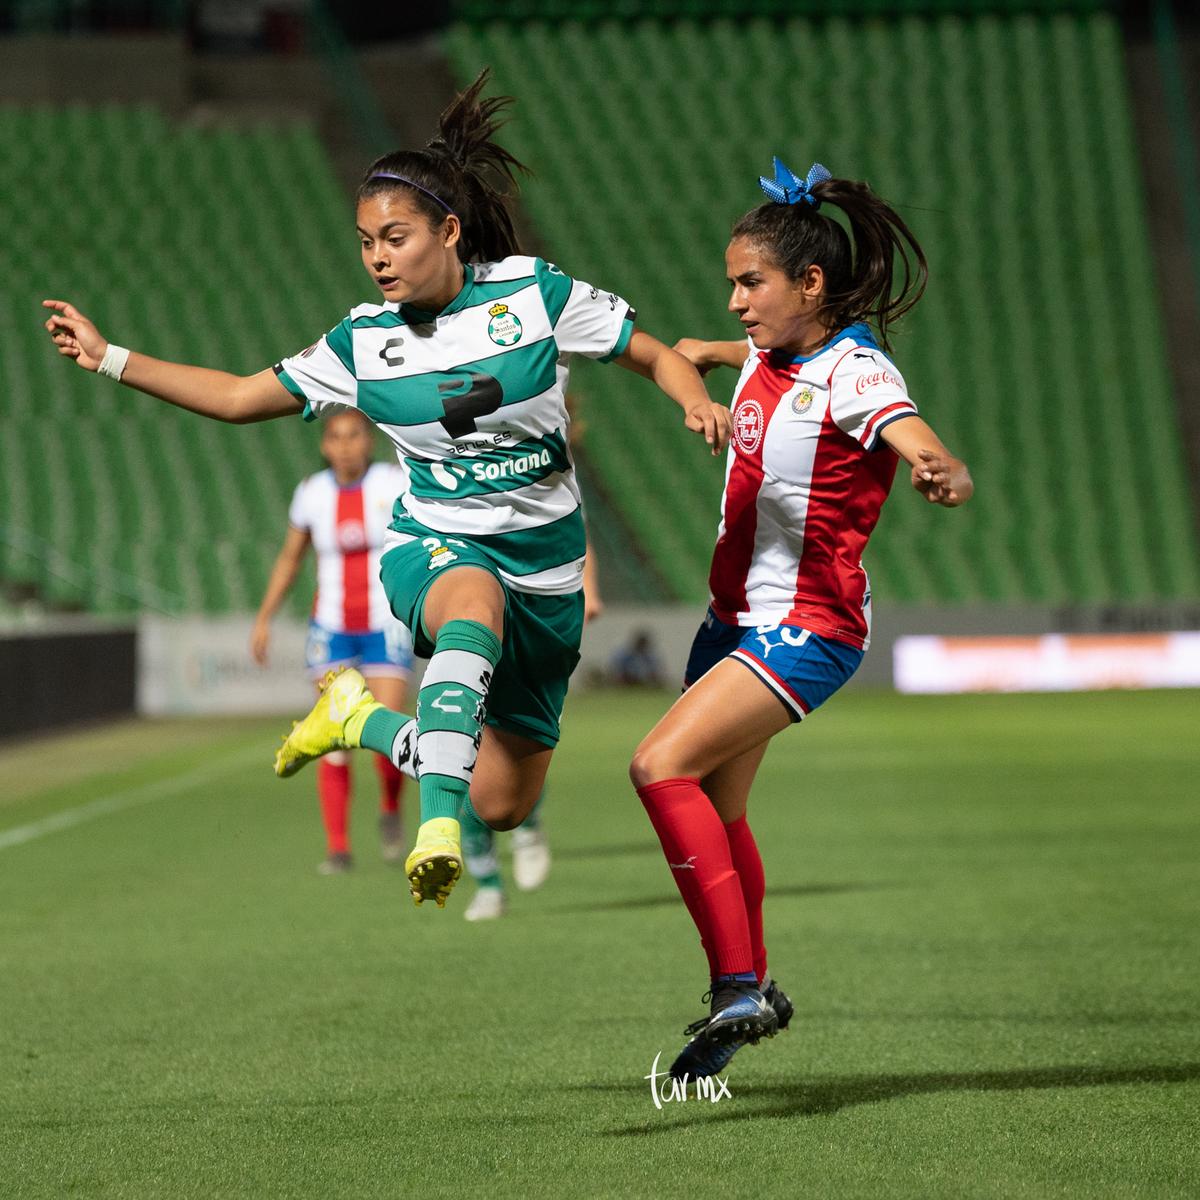 Fotos del Santos vs Chivas femenil